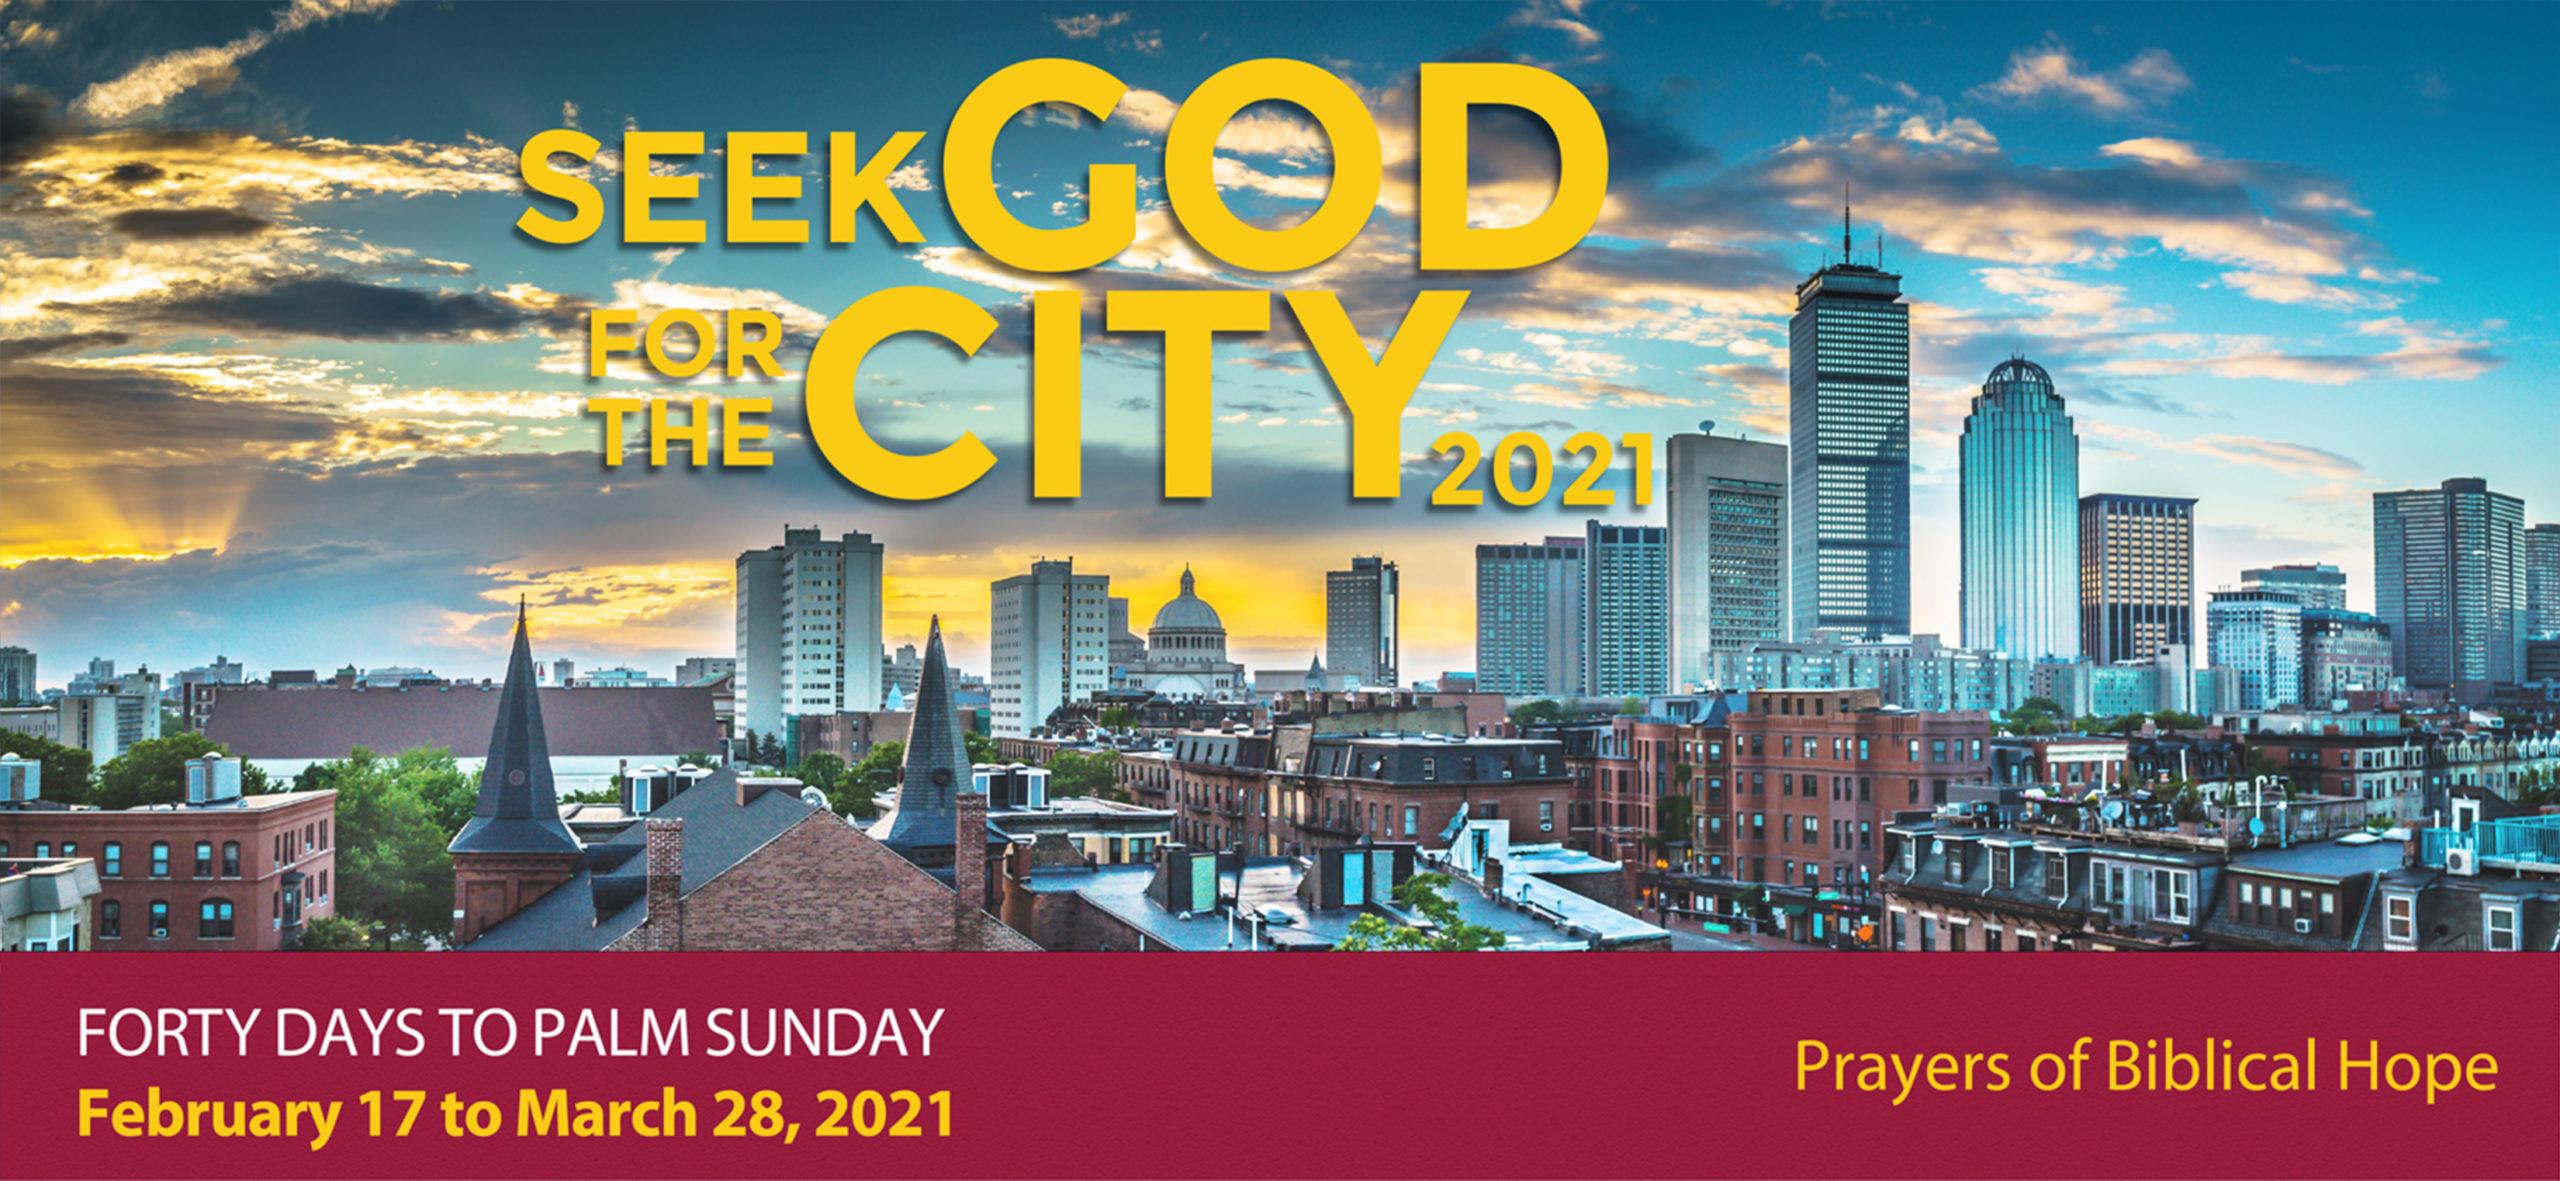 Seek God for the City